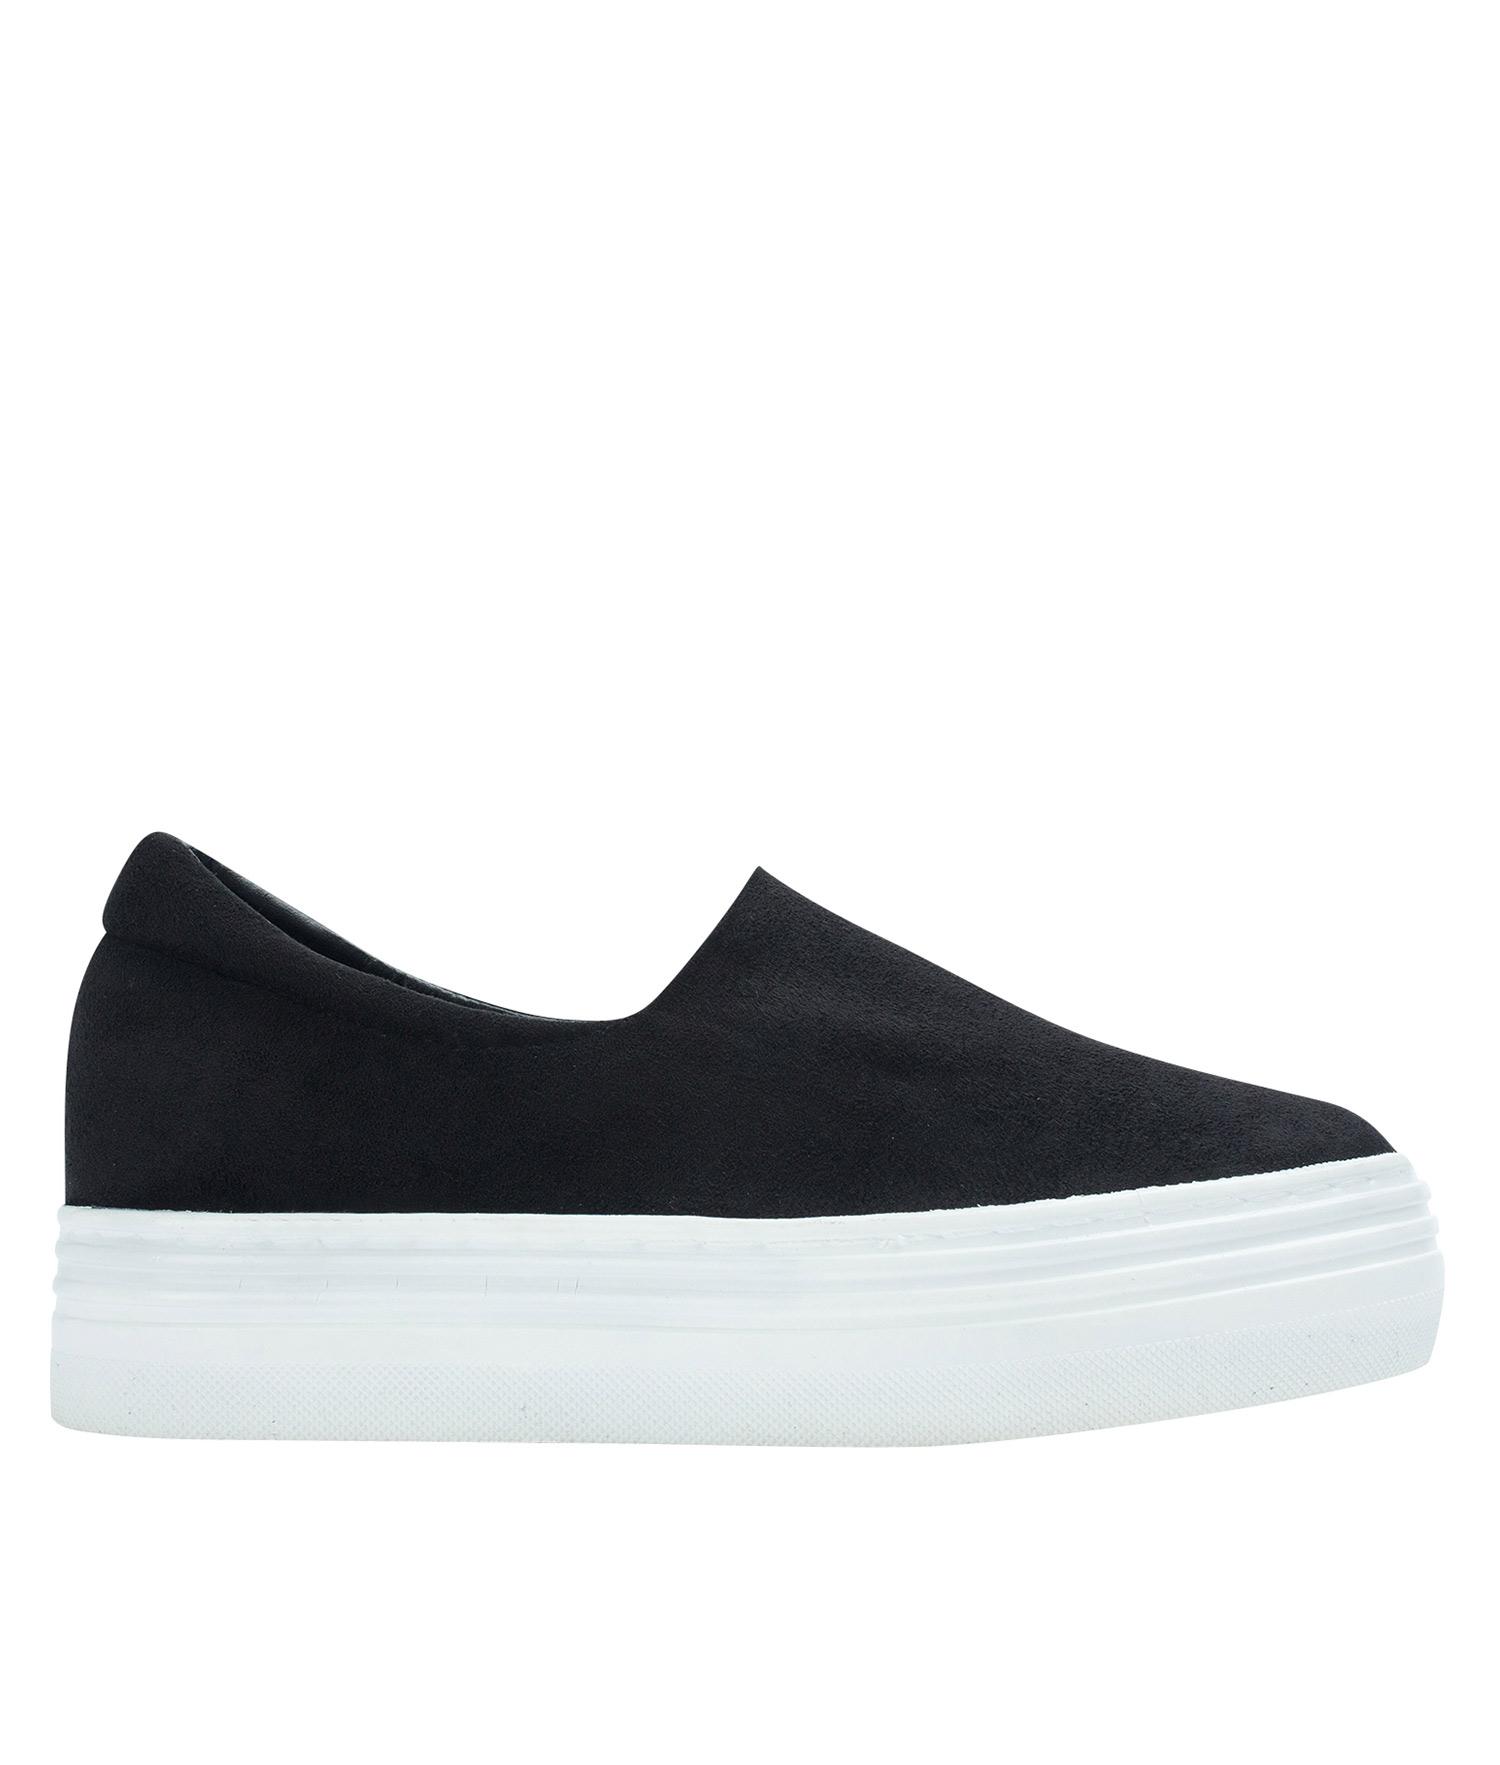 9c08e3564b3 AnnaKastle Womens Faux Suede Stretch Slip-On Platform Sneakers Black